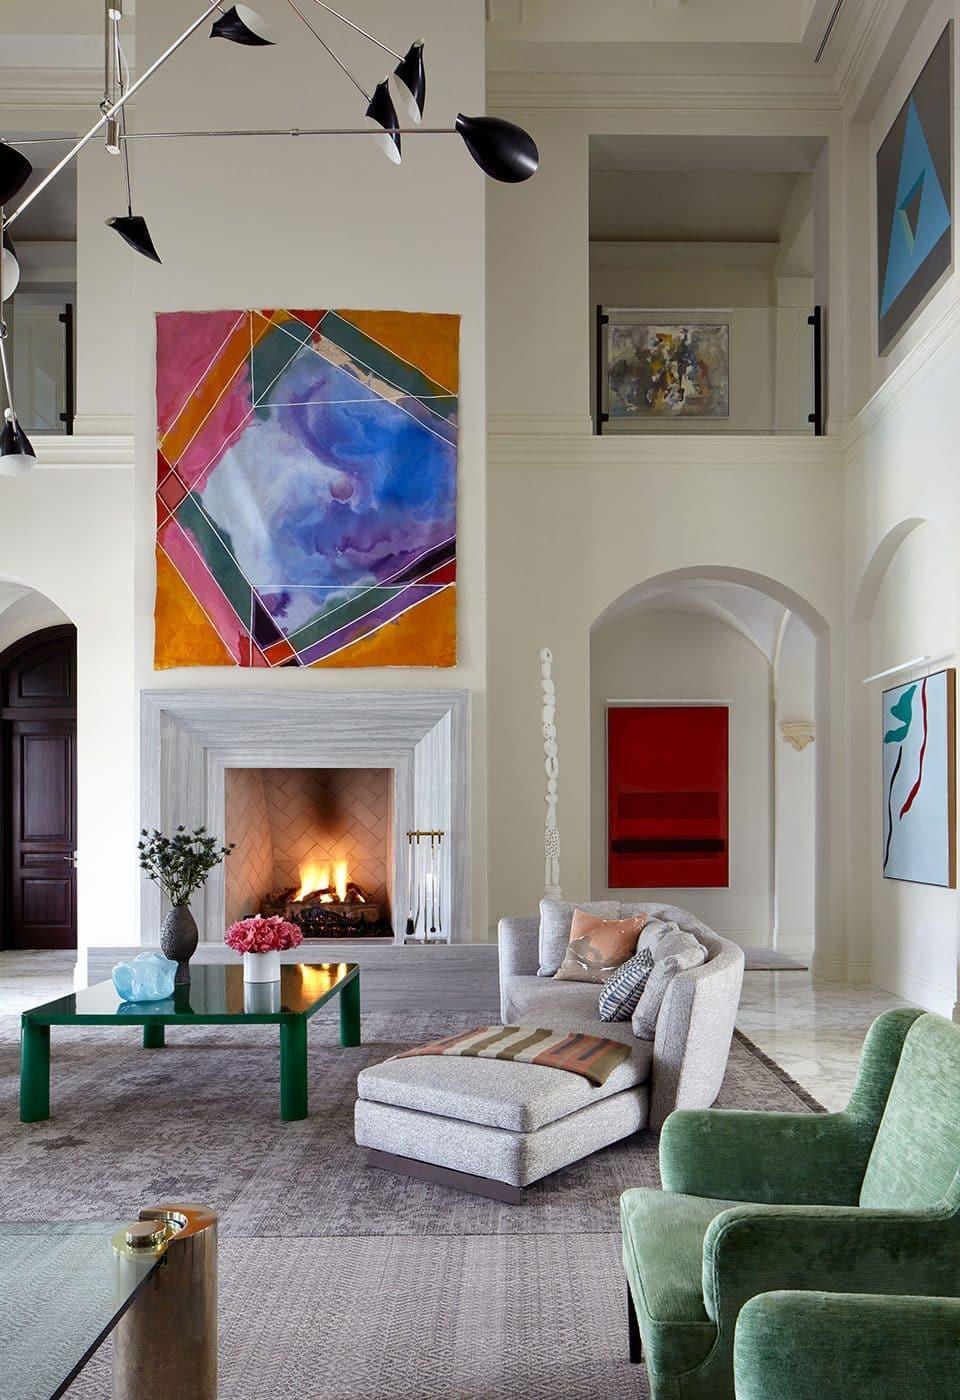 How Designer Elena Frampton Is 'Battling the Boring' in the Hamptons